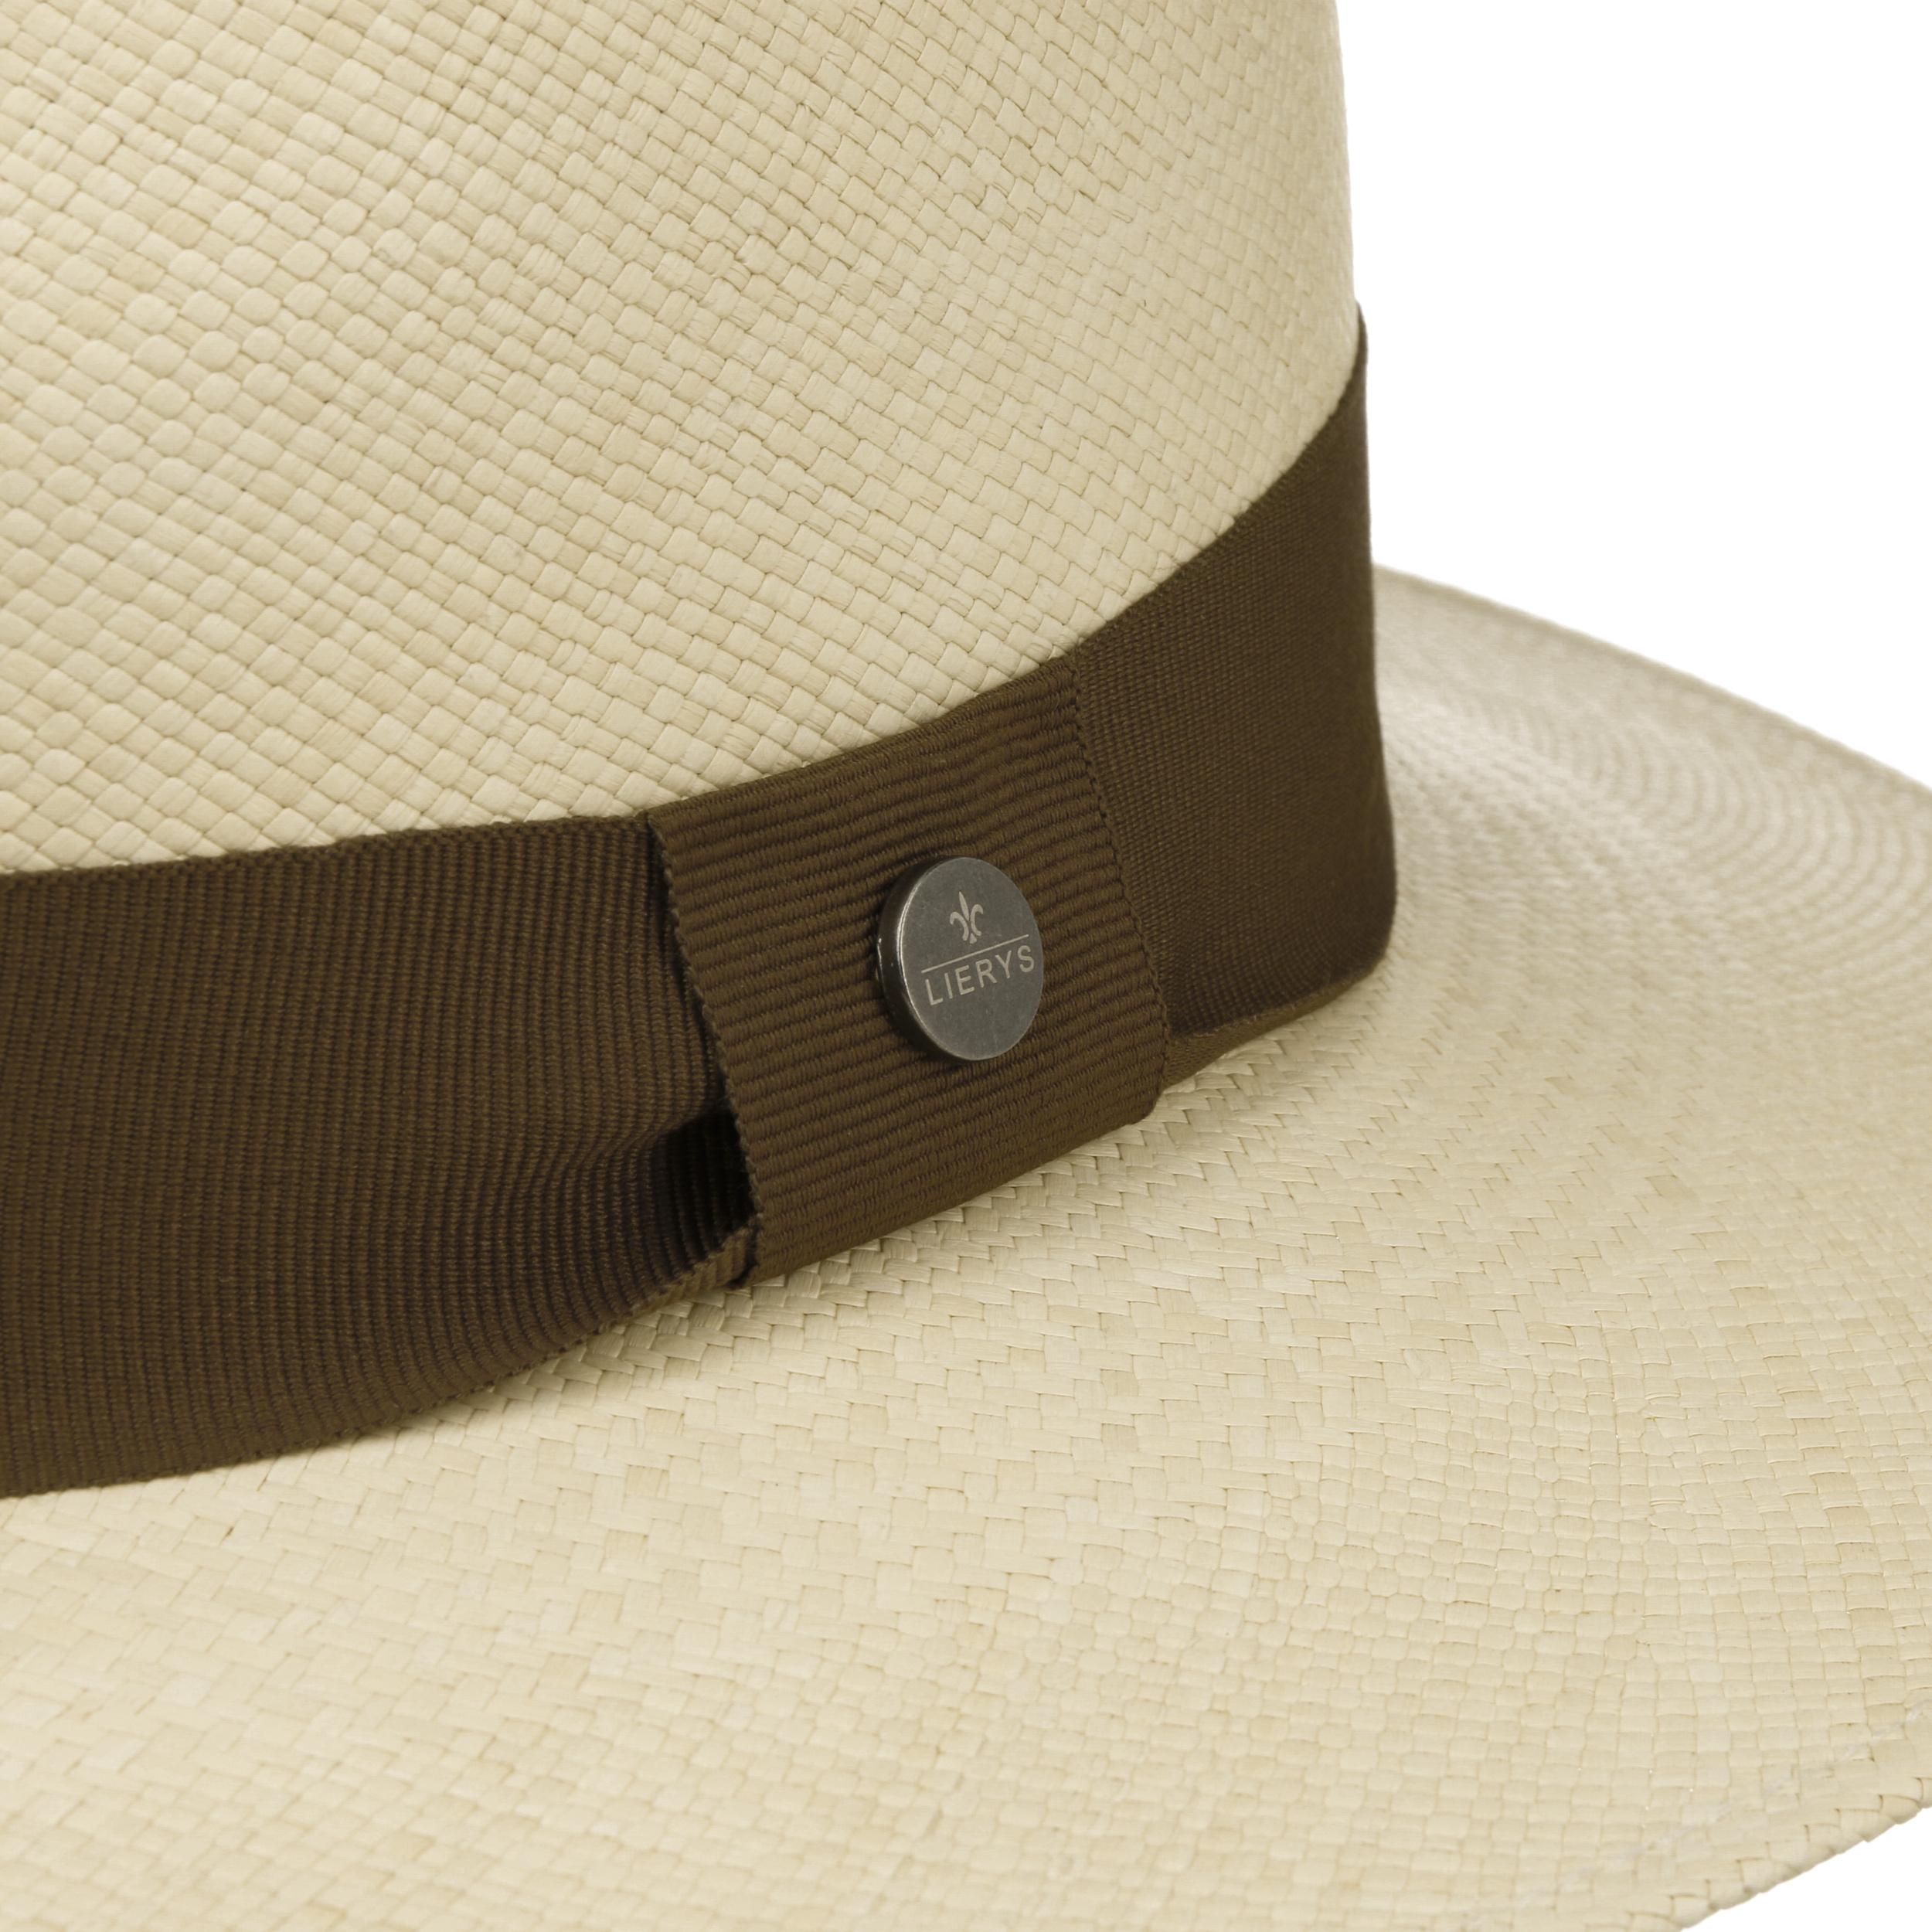 ... Cappello Panama Sophisticated by Lierys - natura-marrone chiaro 3 ... fbd0e0b86371